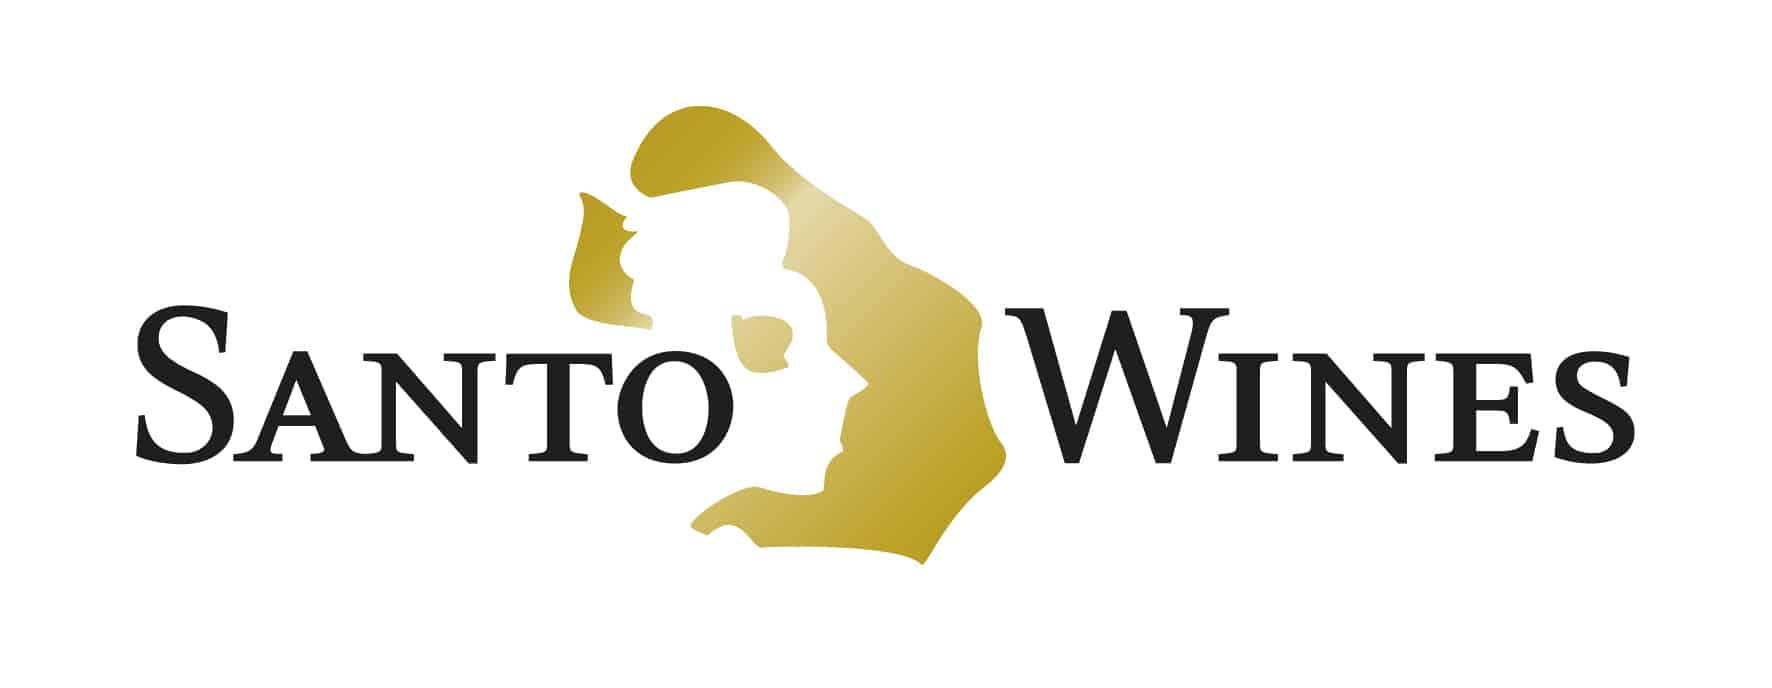 SantoWines Logo